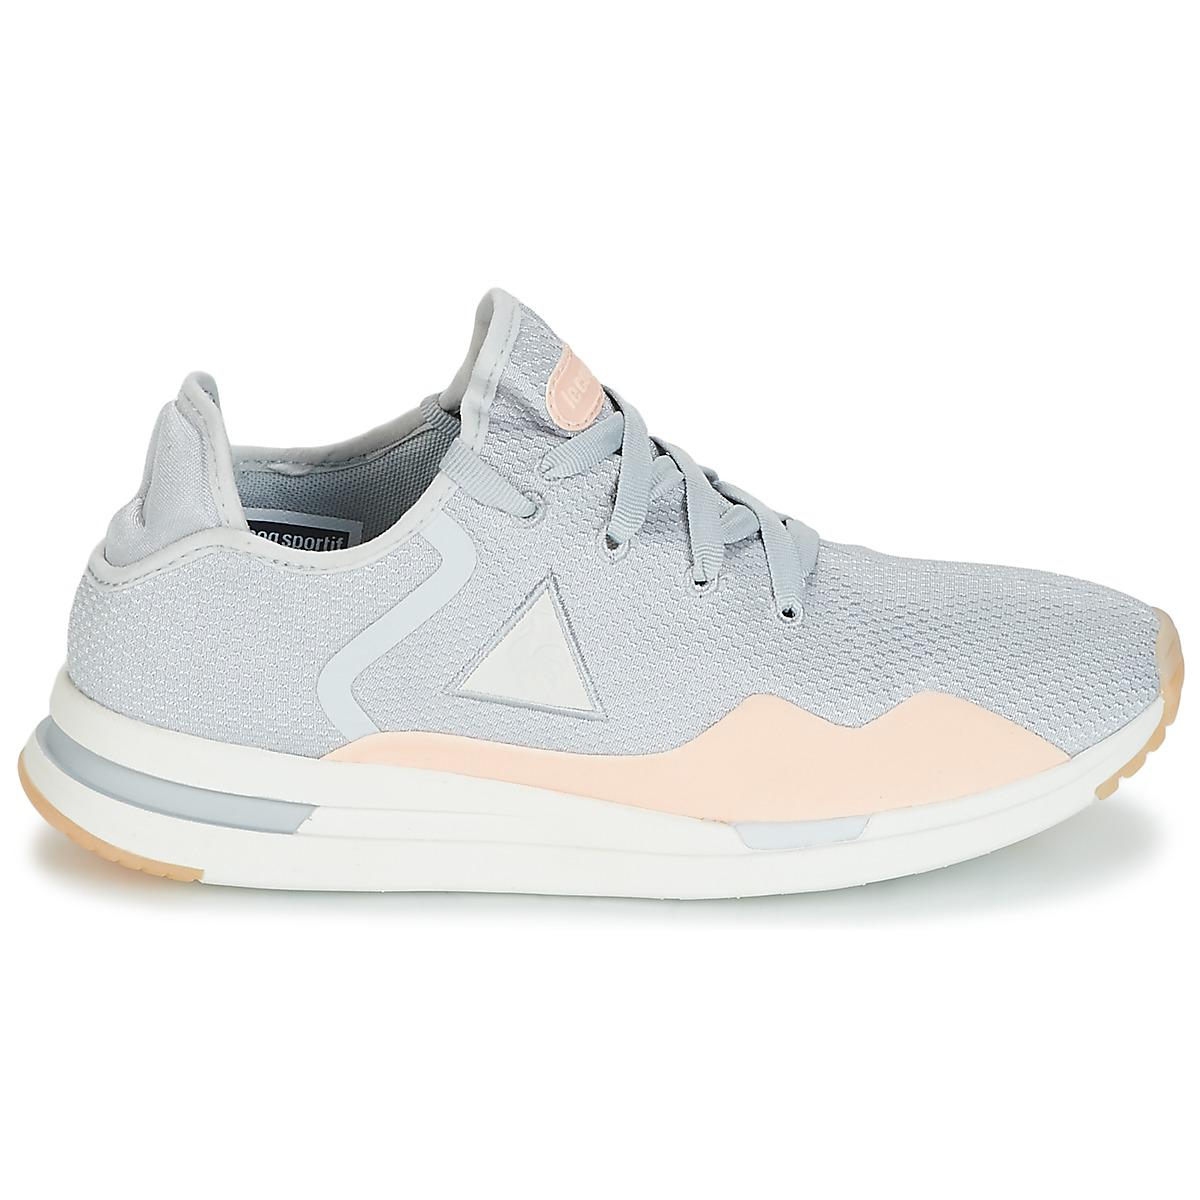 fc15e4033982 Le Coq Sportif Solas W Summer Flavor Shoes (trainers) in Gray - Save ...